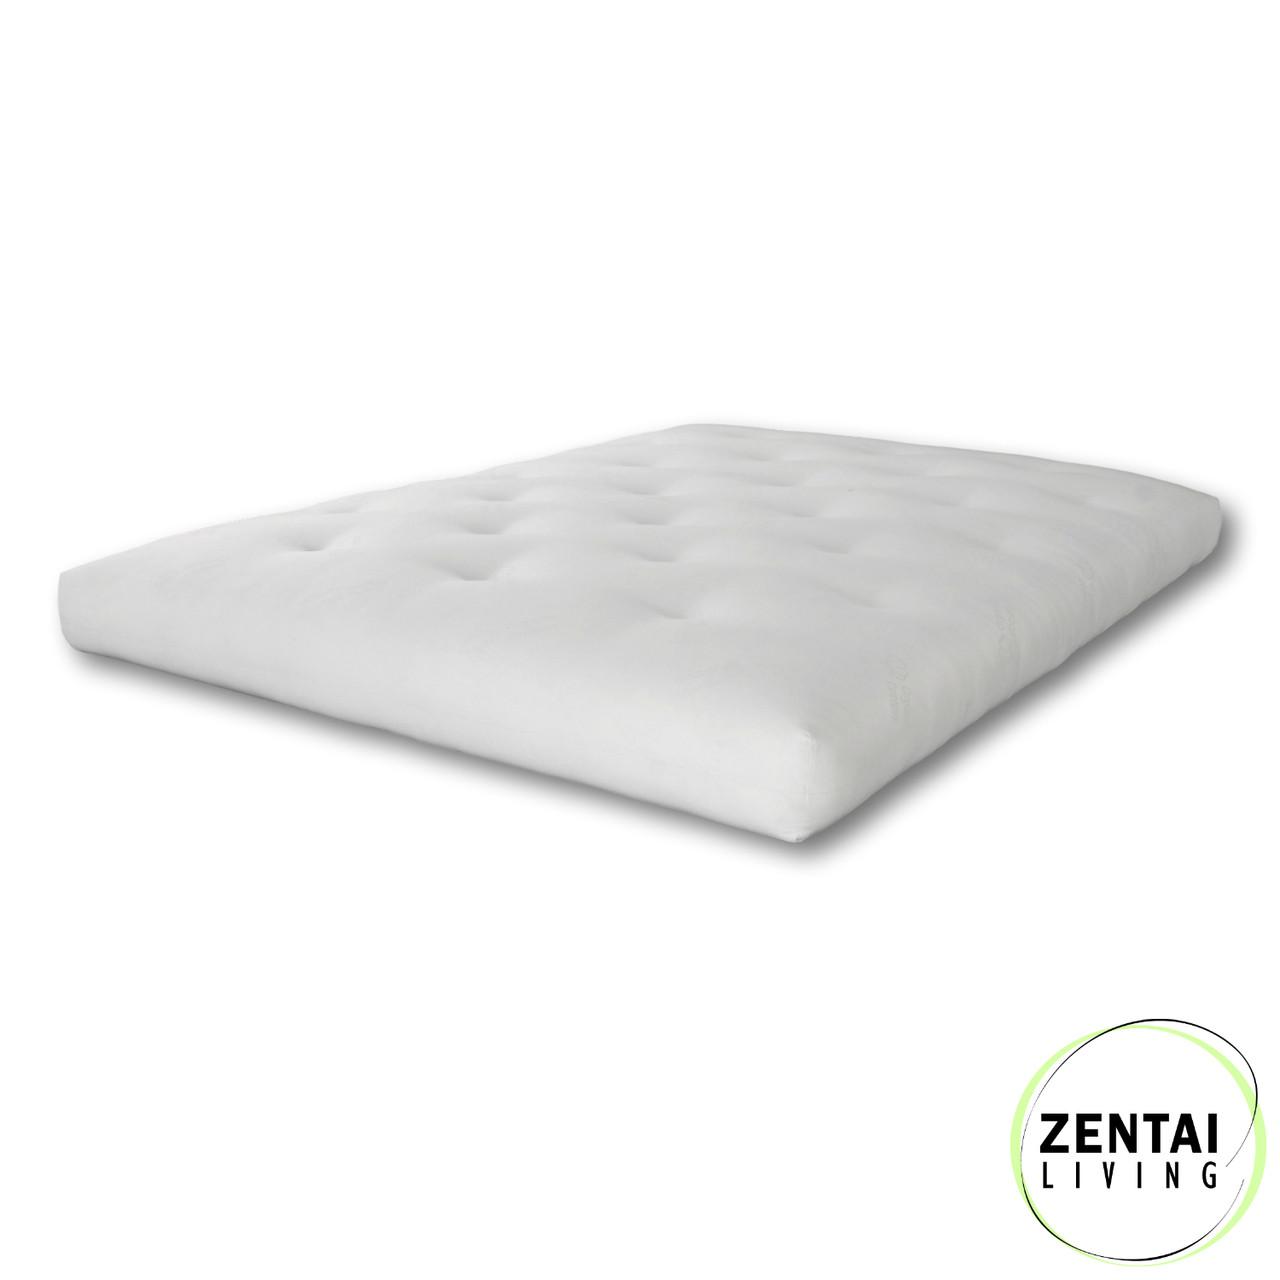 Zentai S Modern Style Durable Foam Core Cotton Futon 18 Cm Thick